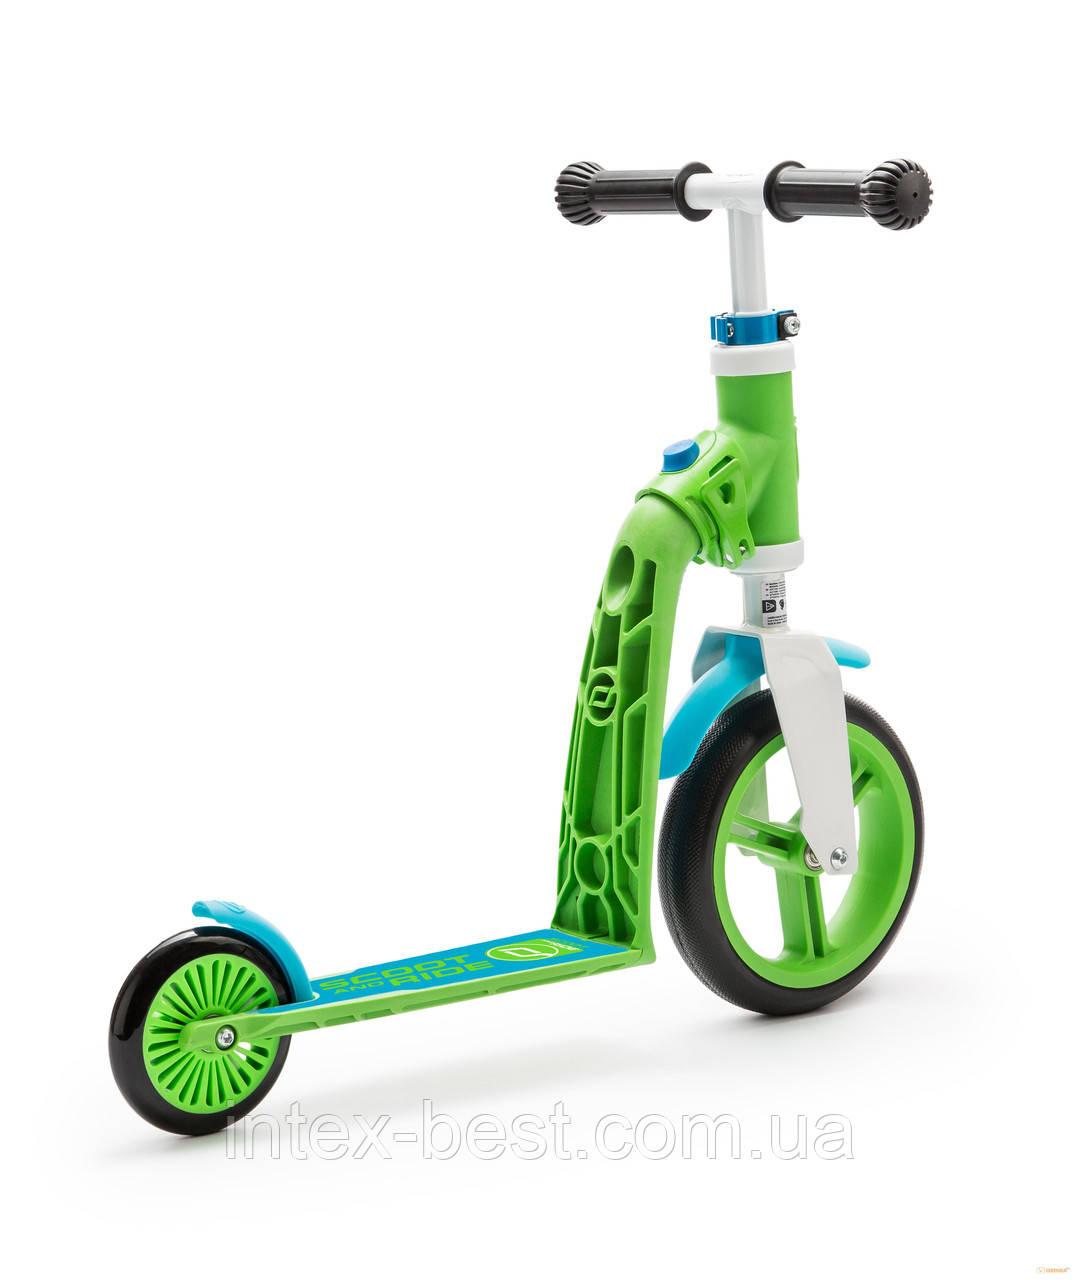 Самокат Scoot&Ride Highwaybaby Зелено-Синий SR-216271